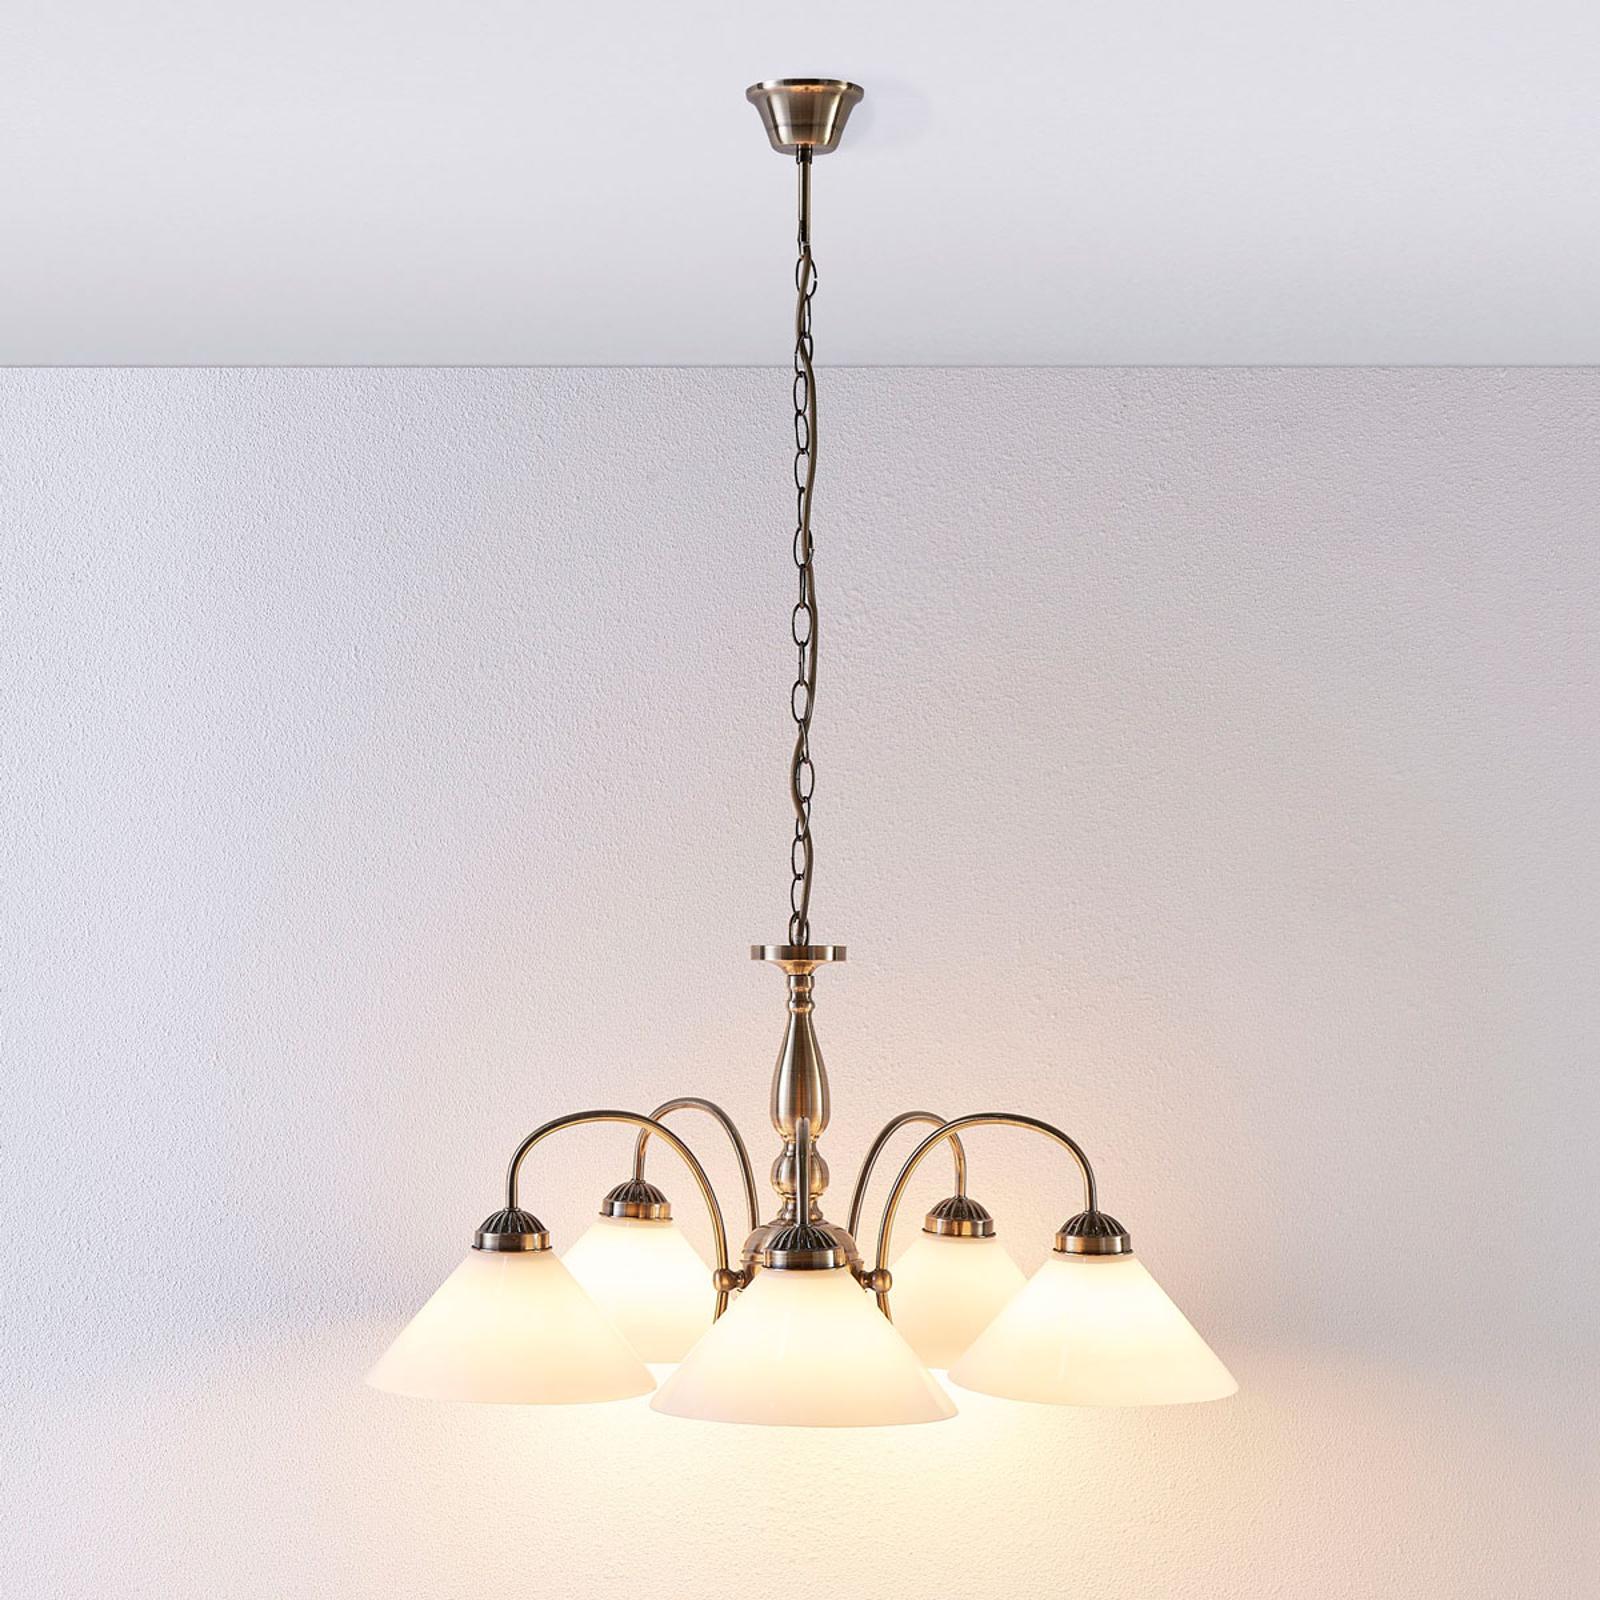 Clásica lámpara colgante Otis, 5 llamas